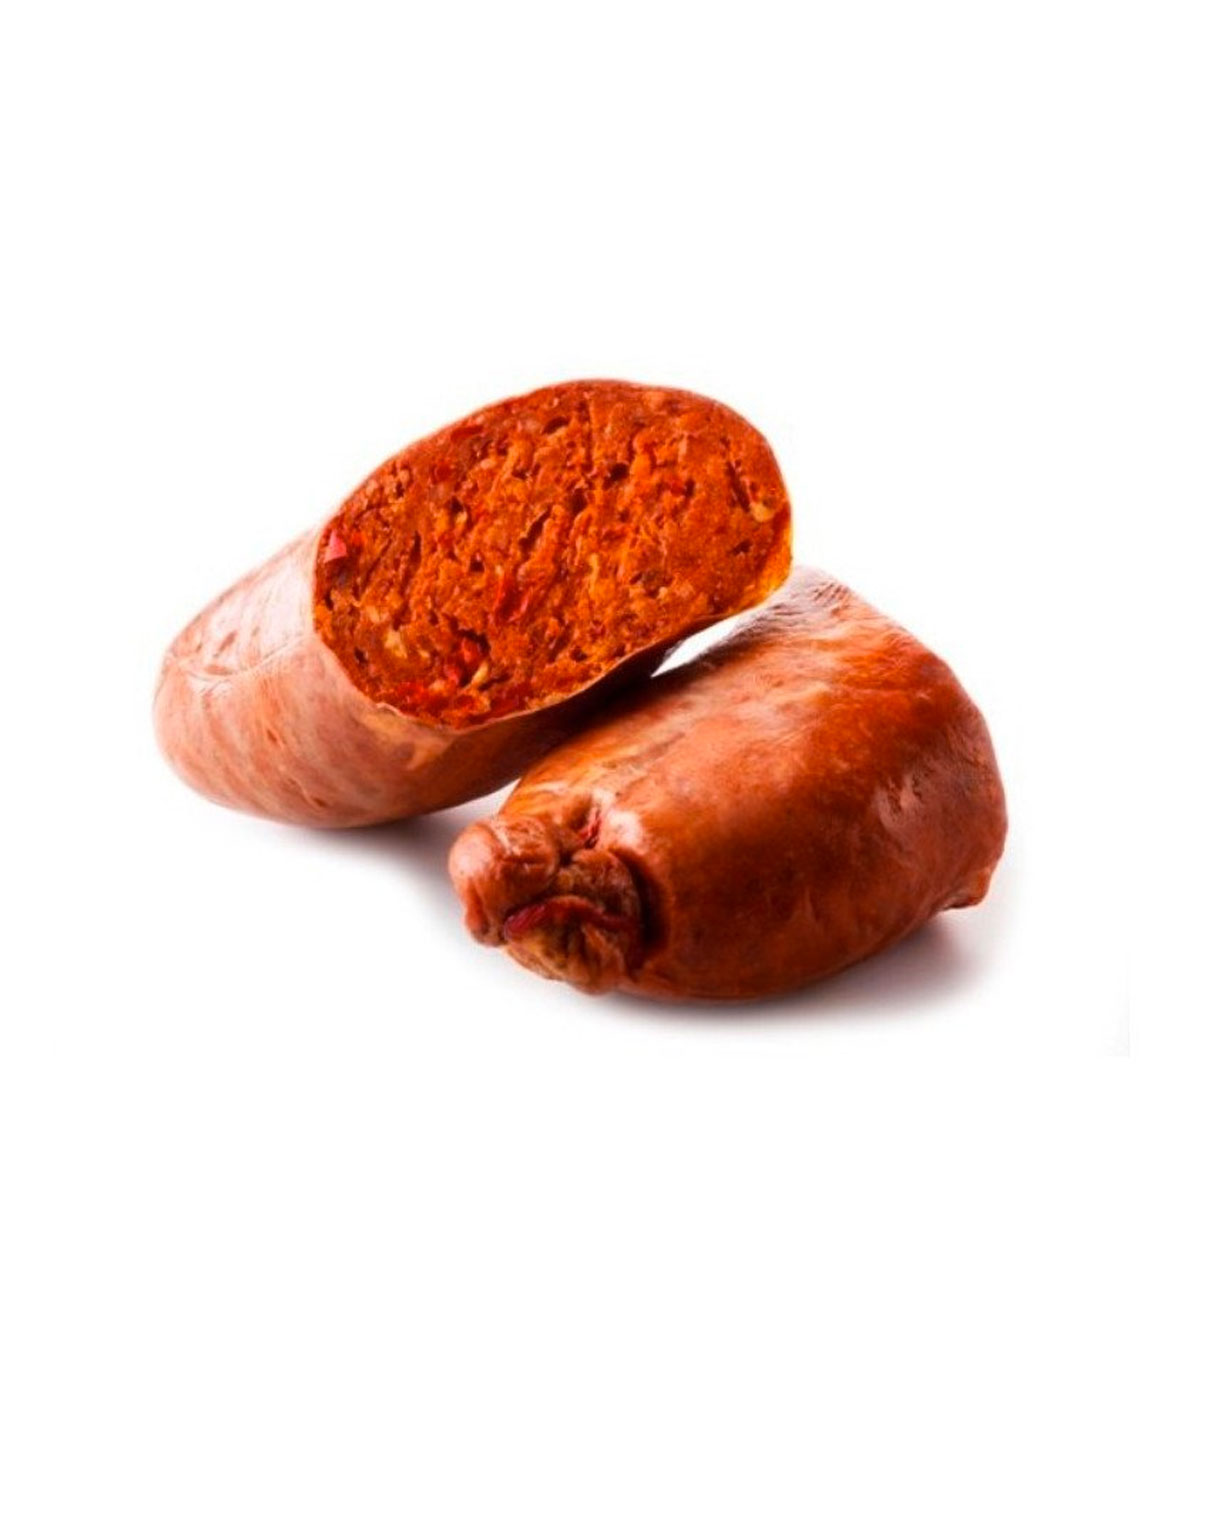 prodotti tipici calabresi nduja